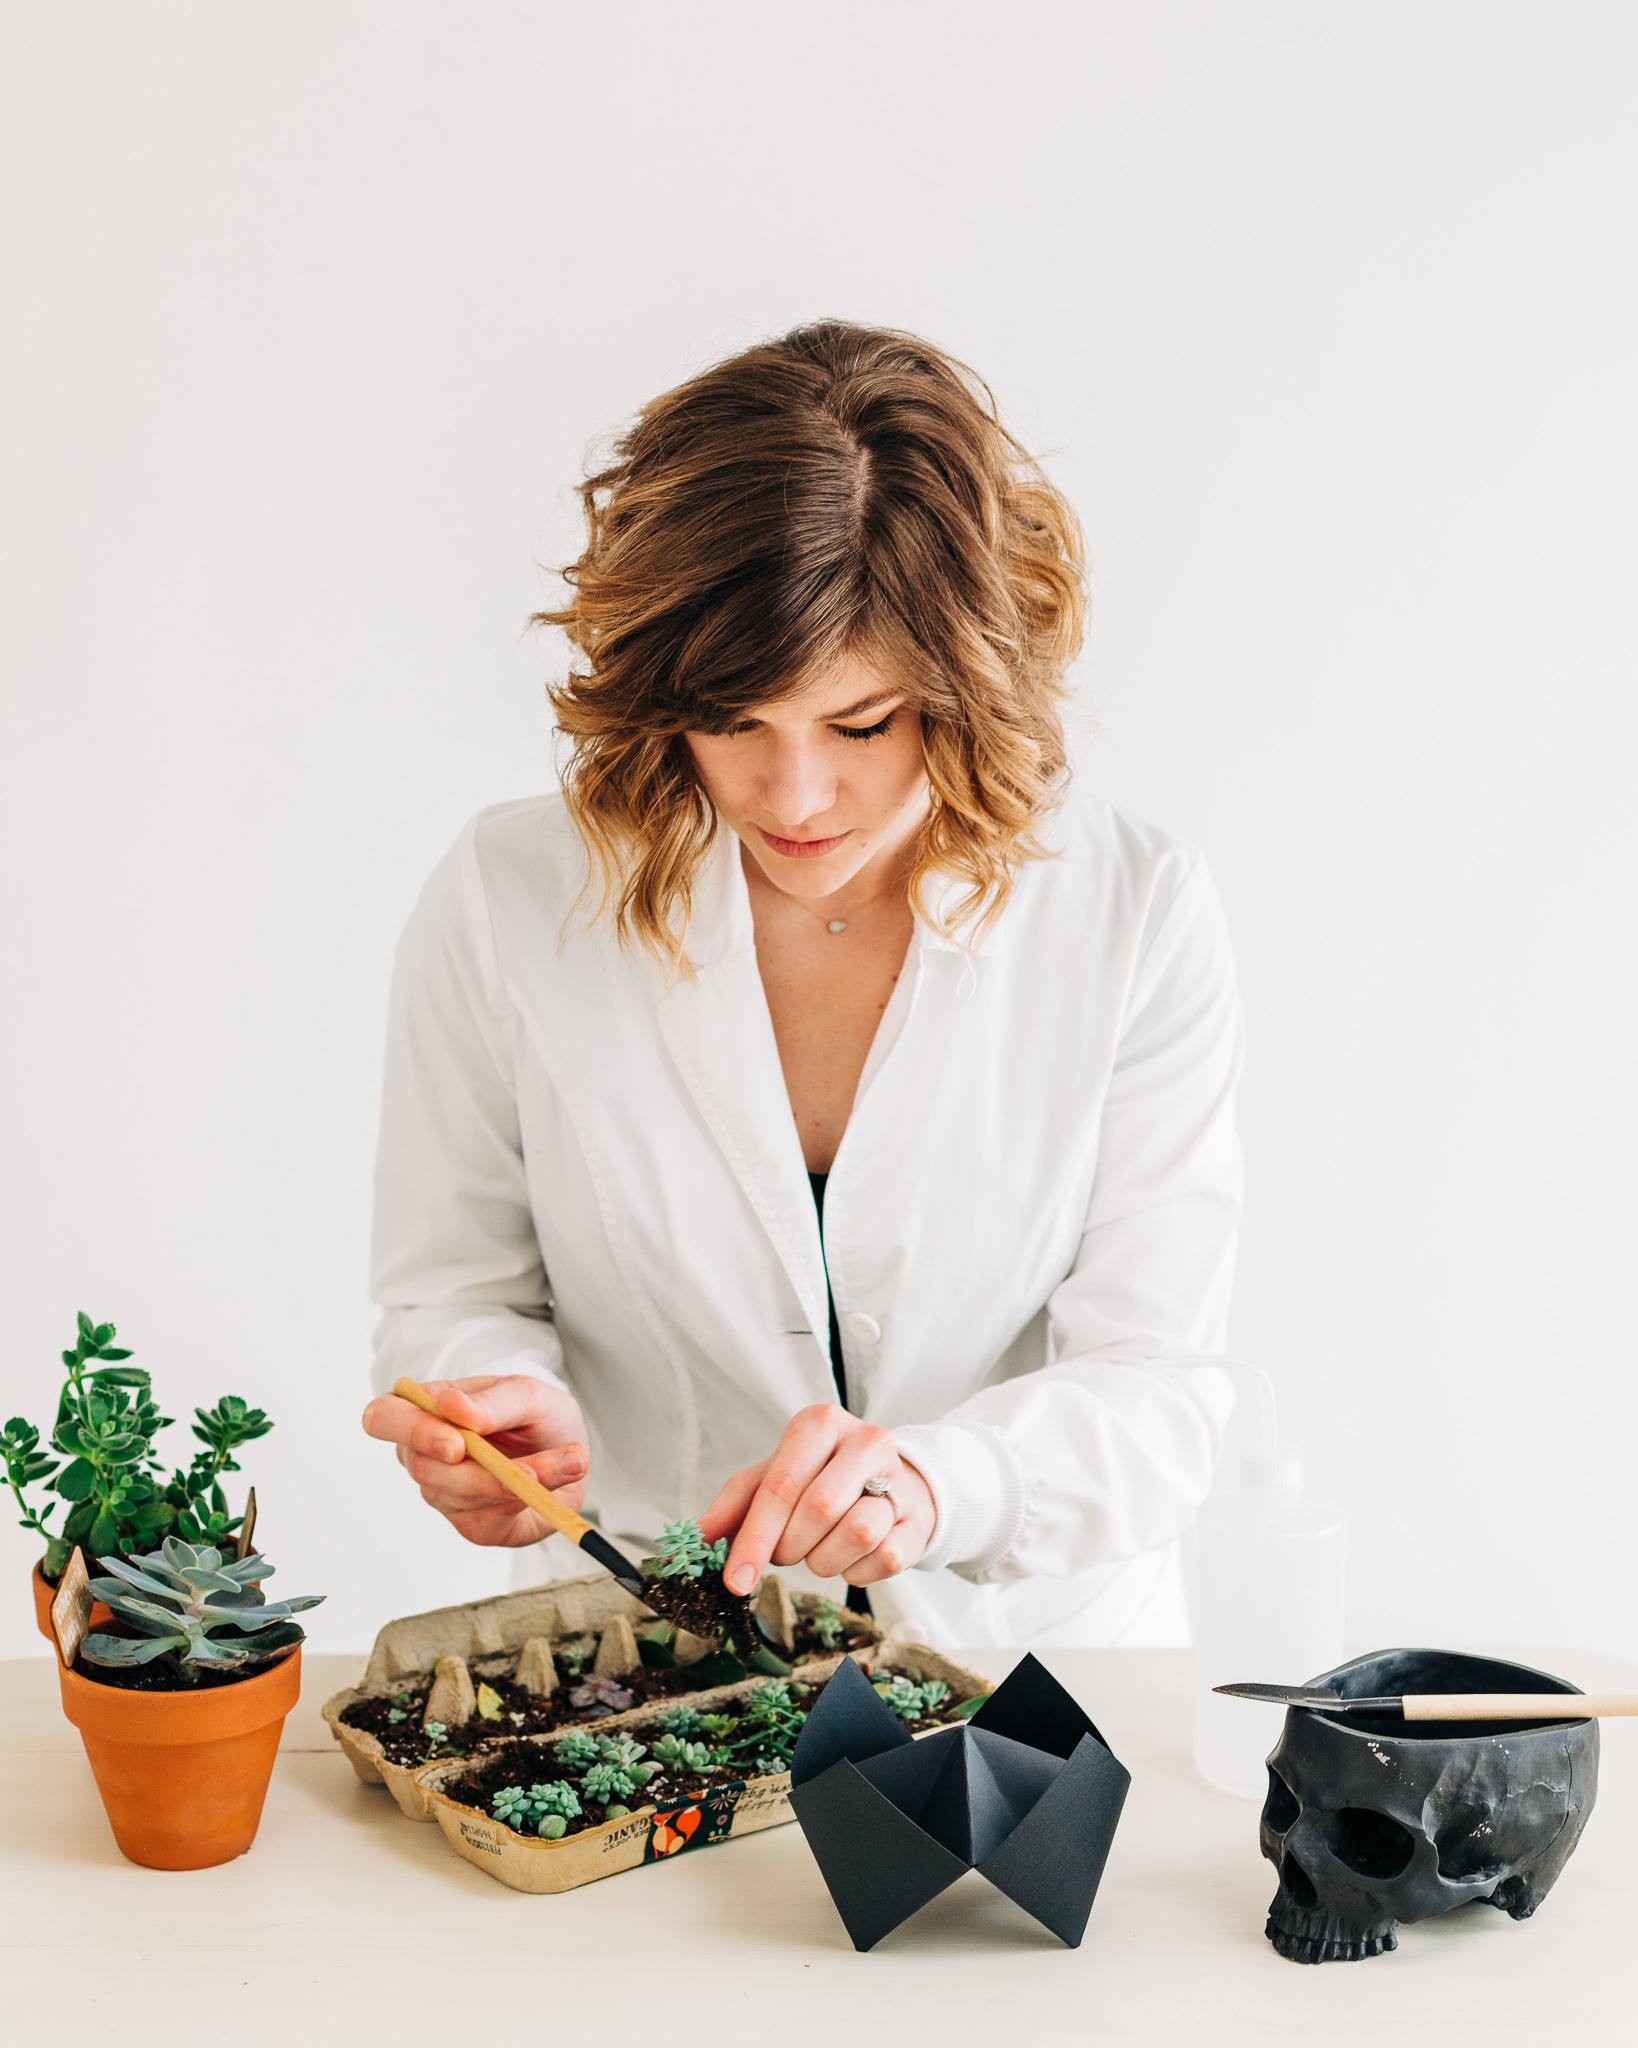 Olympia Washington. Personal Branding and Headshot Photographer